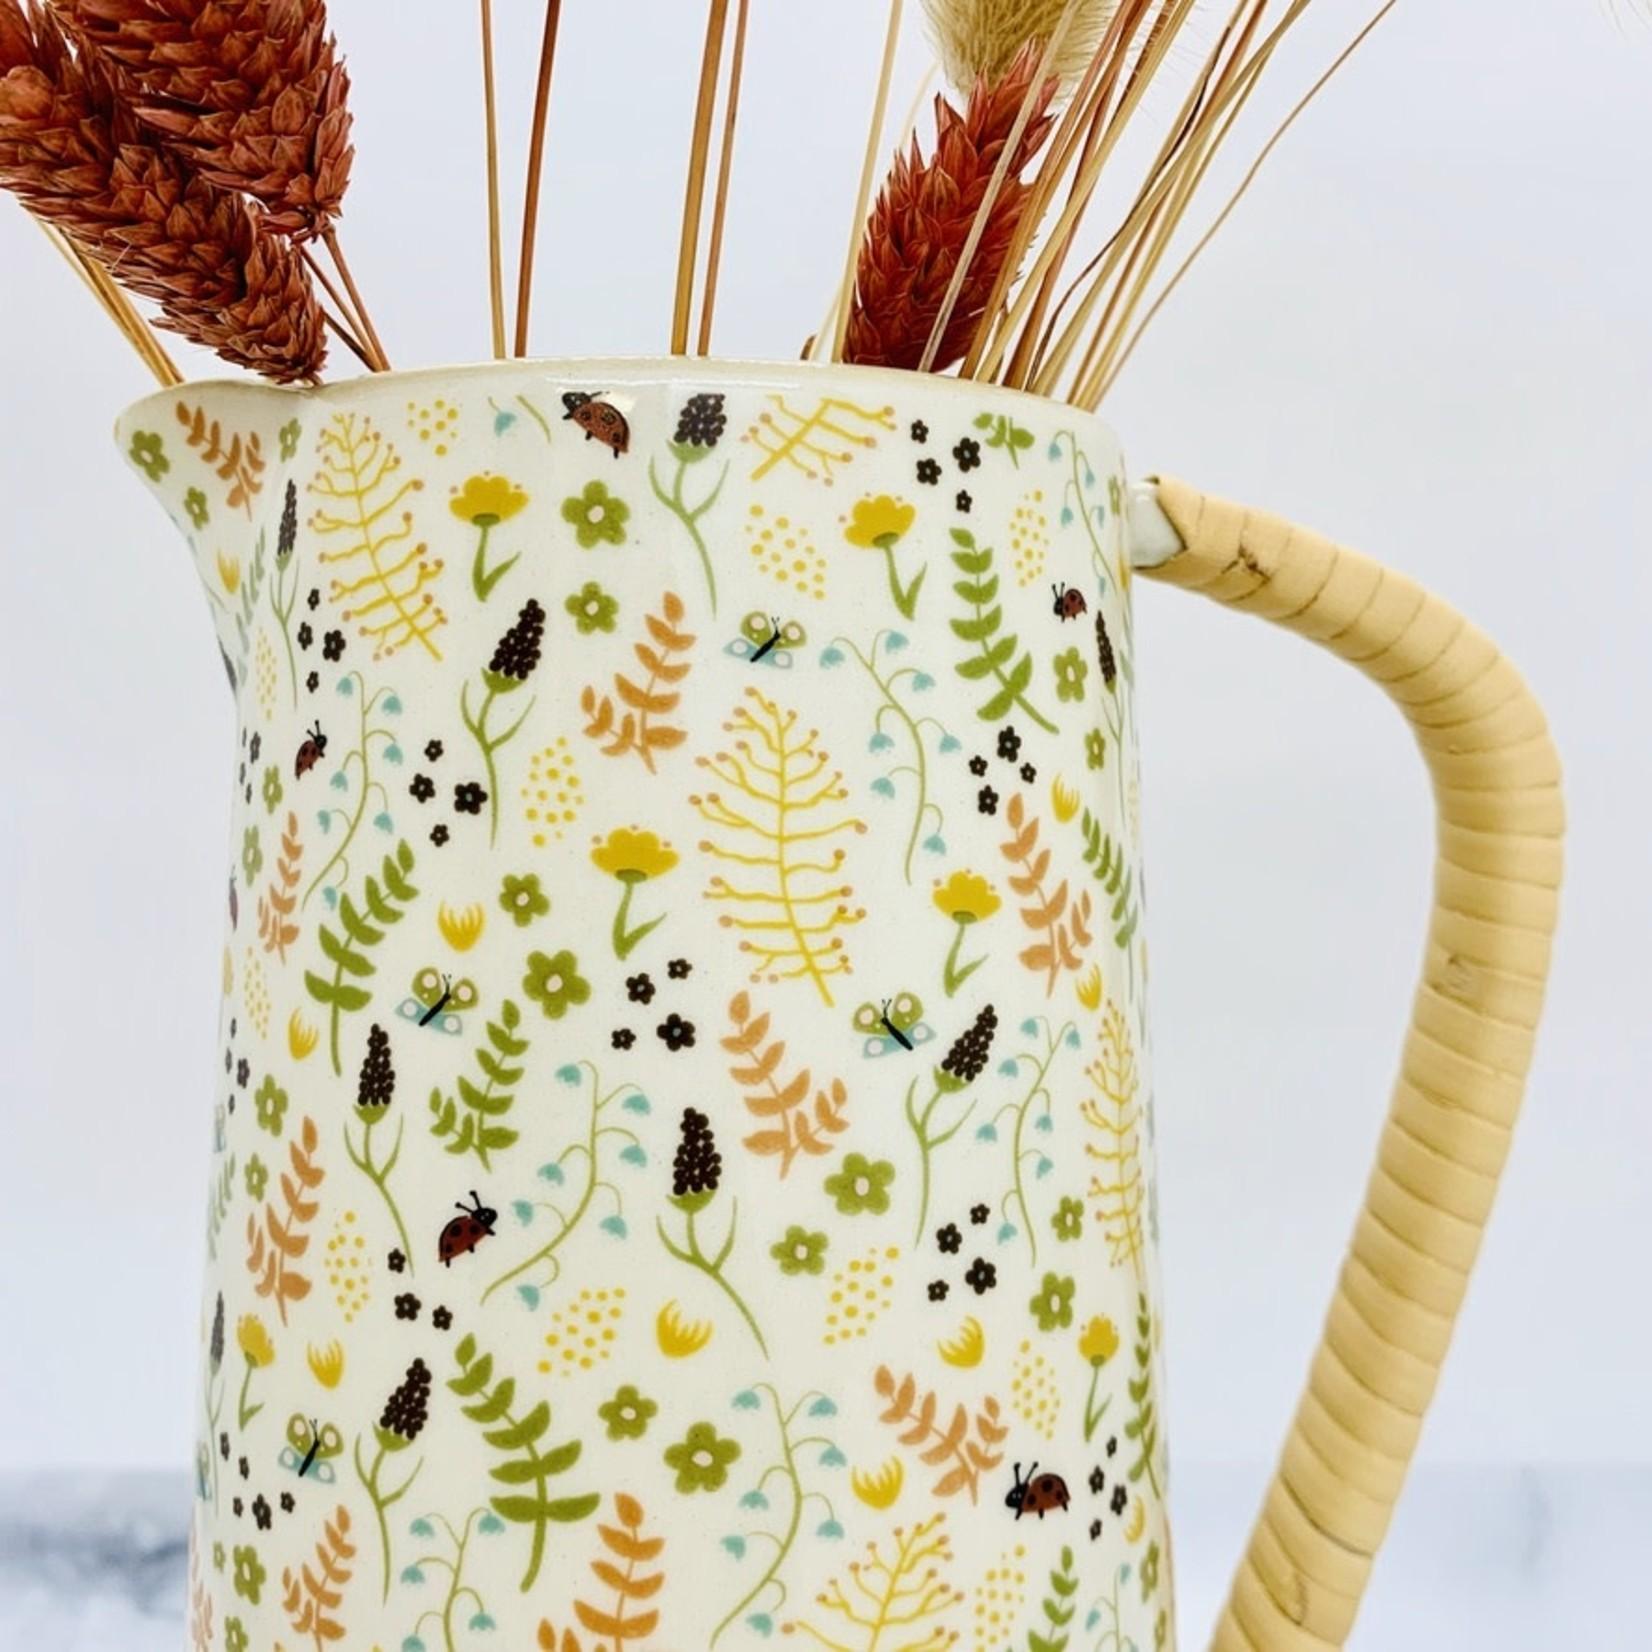 24 oz. Stoneware Pitcher w/ Rattan Wrapped Handle & Floral Pattern